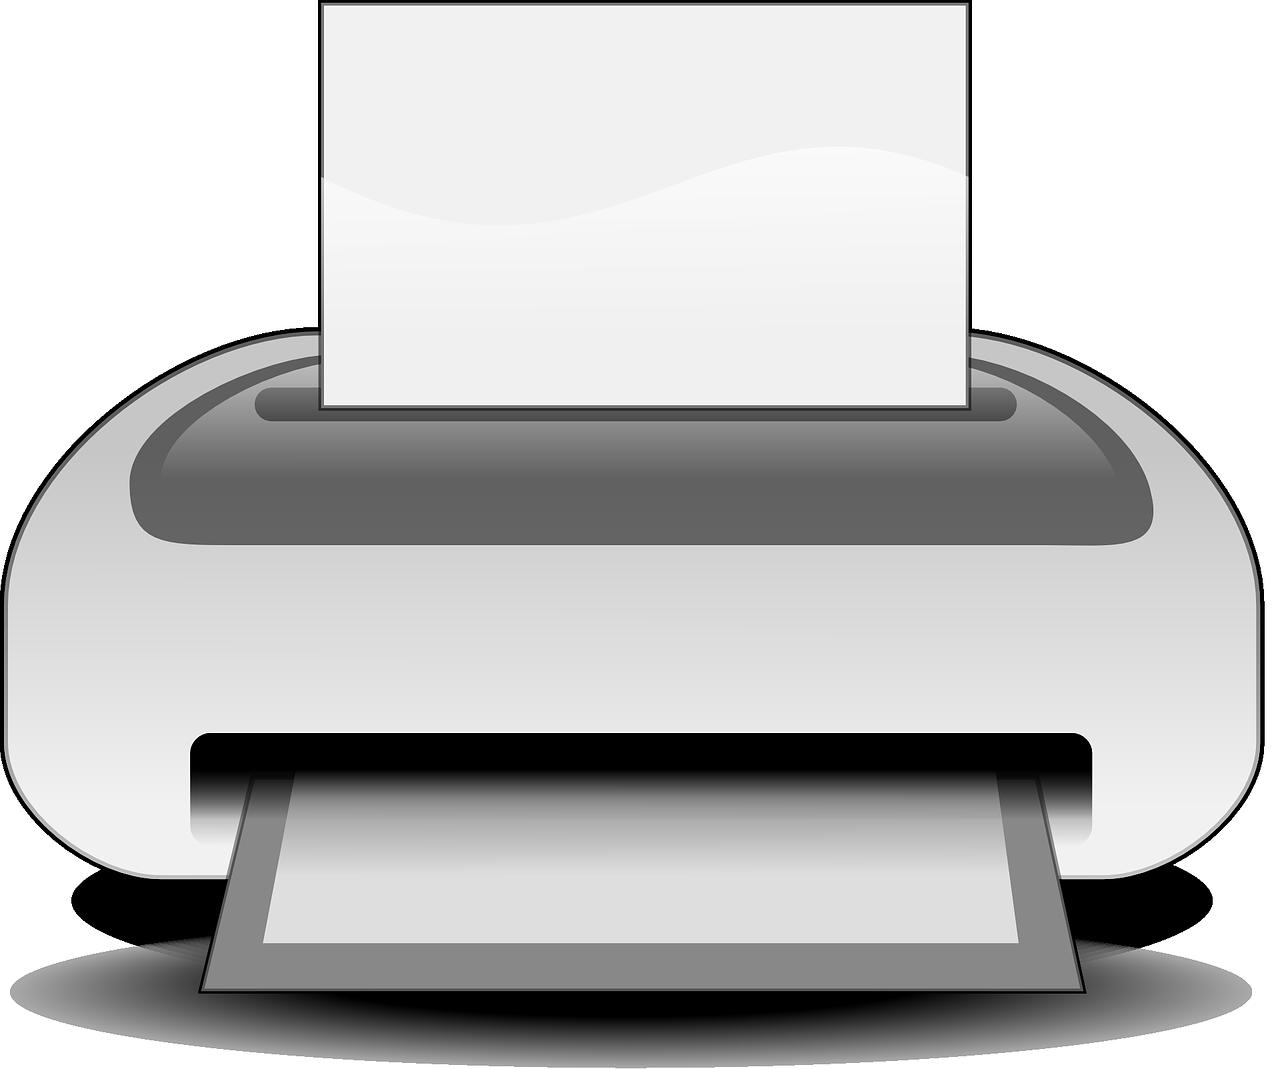 PostScript Used For Cross-Site Printing Attacks